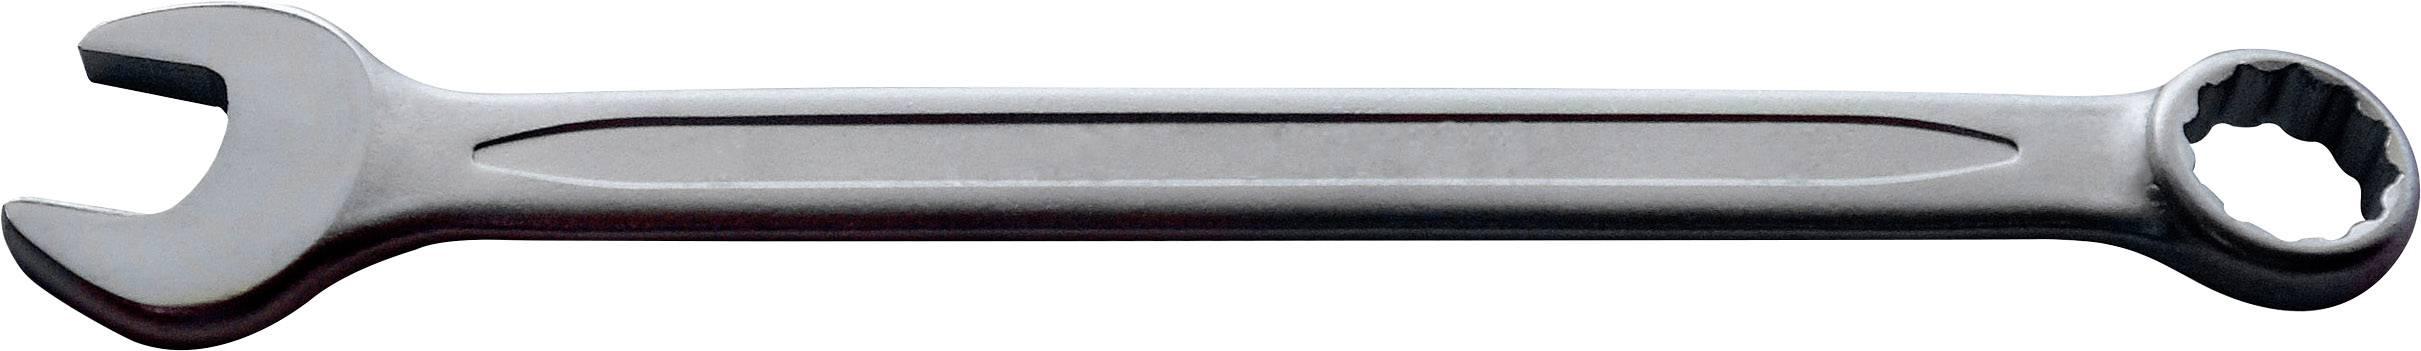 Očkoplochý kľúč TOOLCRAFT 820838, DIN 3113 Form A, 17 mm